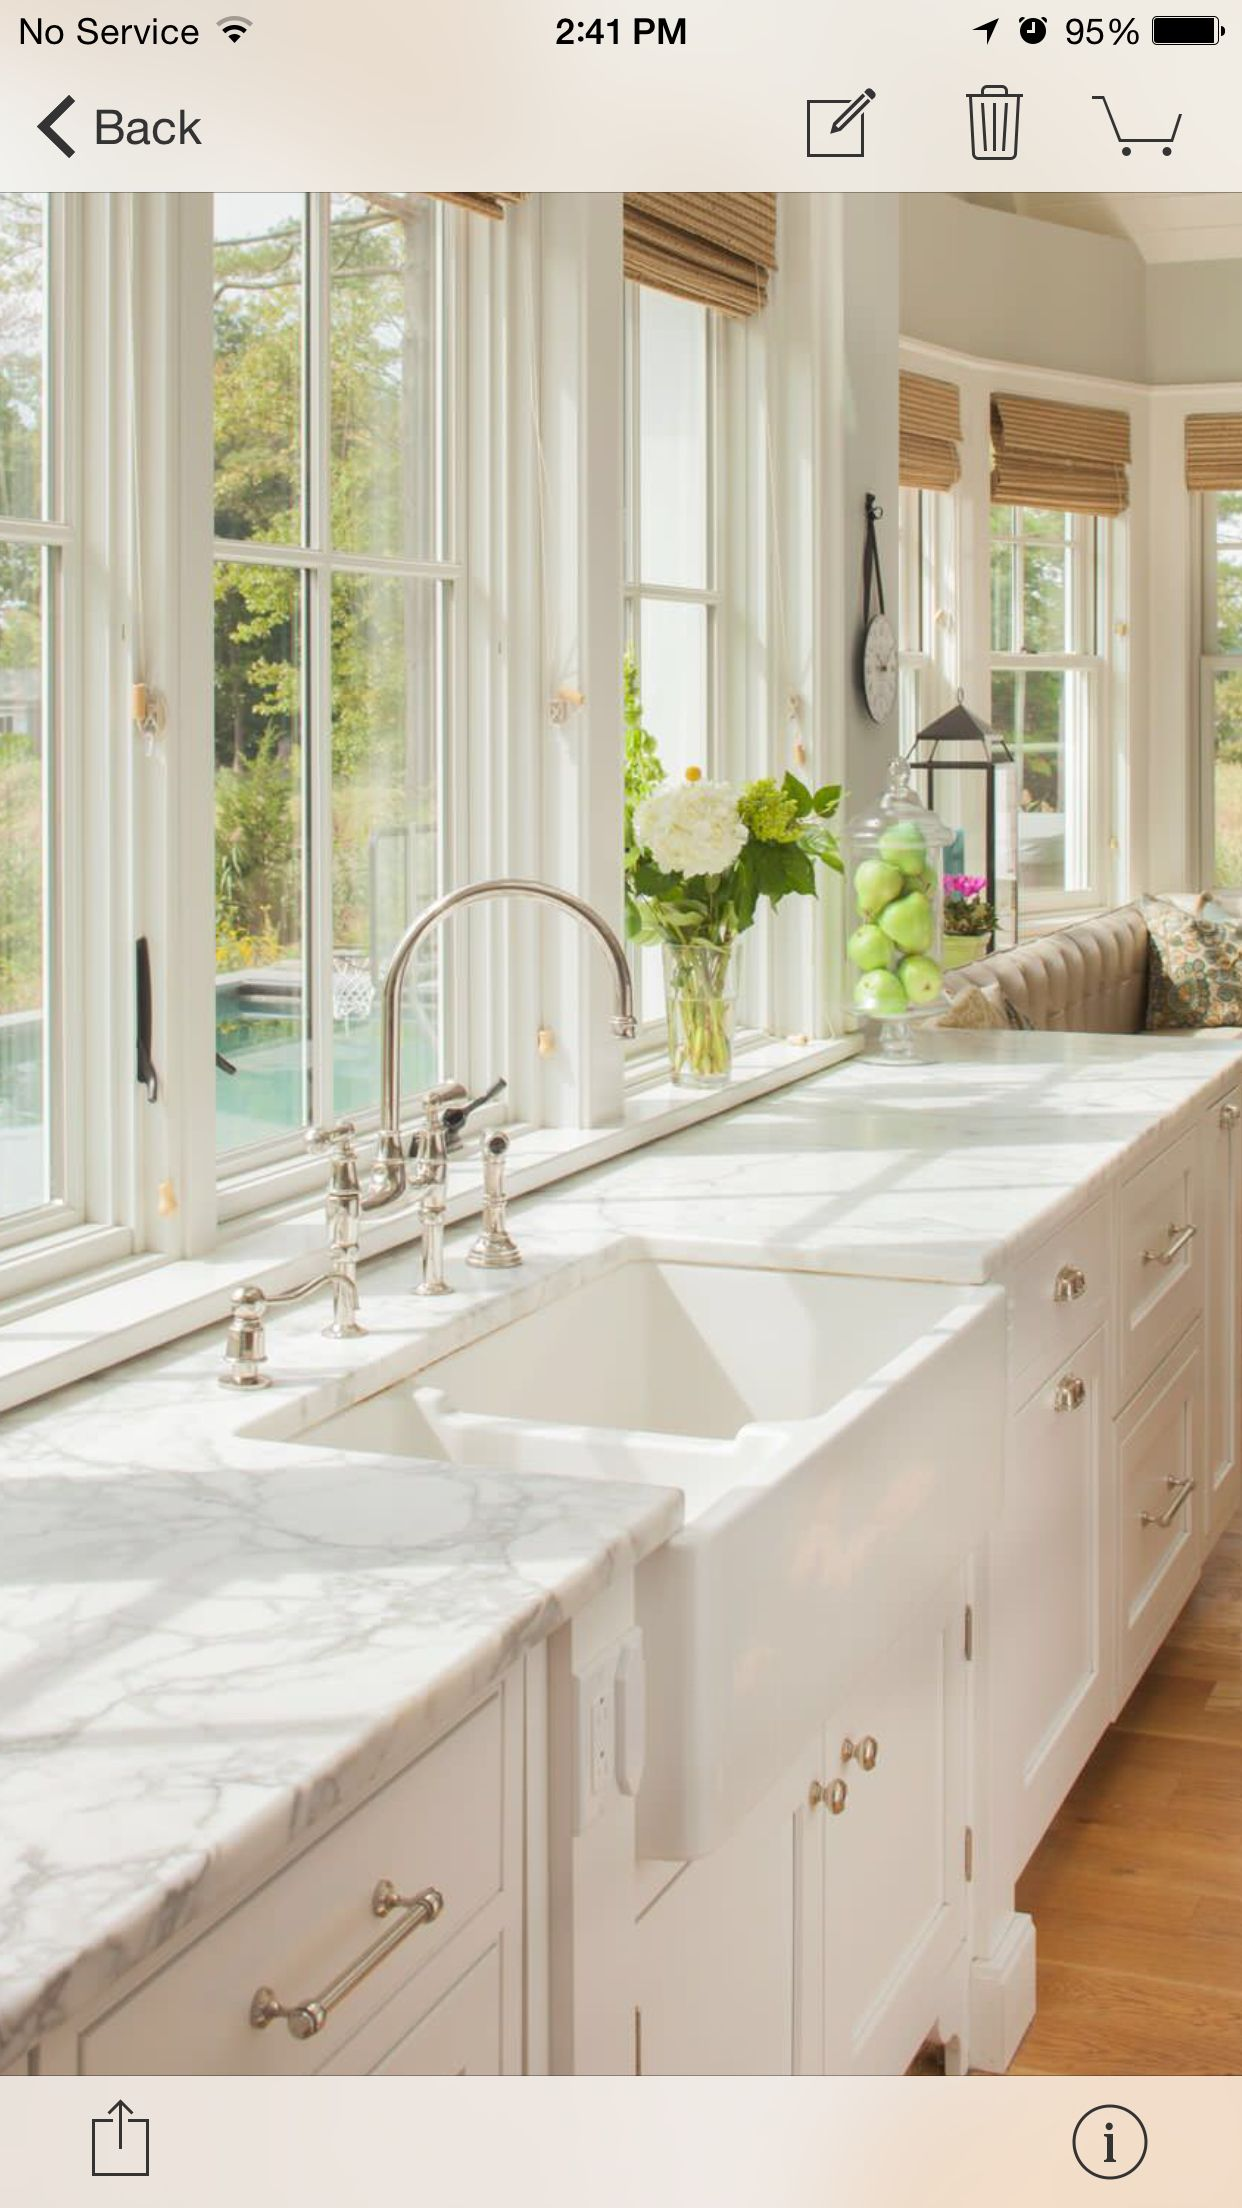 Kitchen window over sink  apron sink  kitchen  pinterest  apron sink apron and sinks